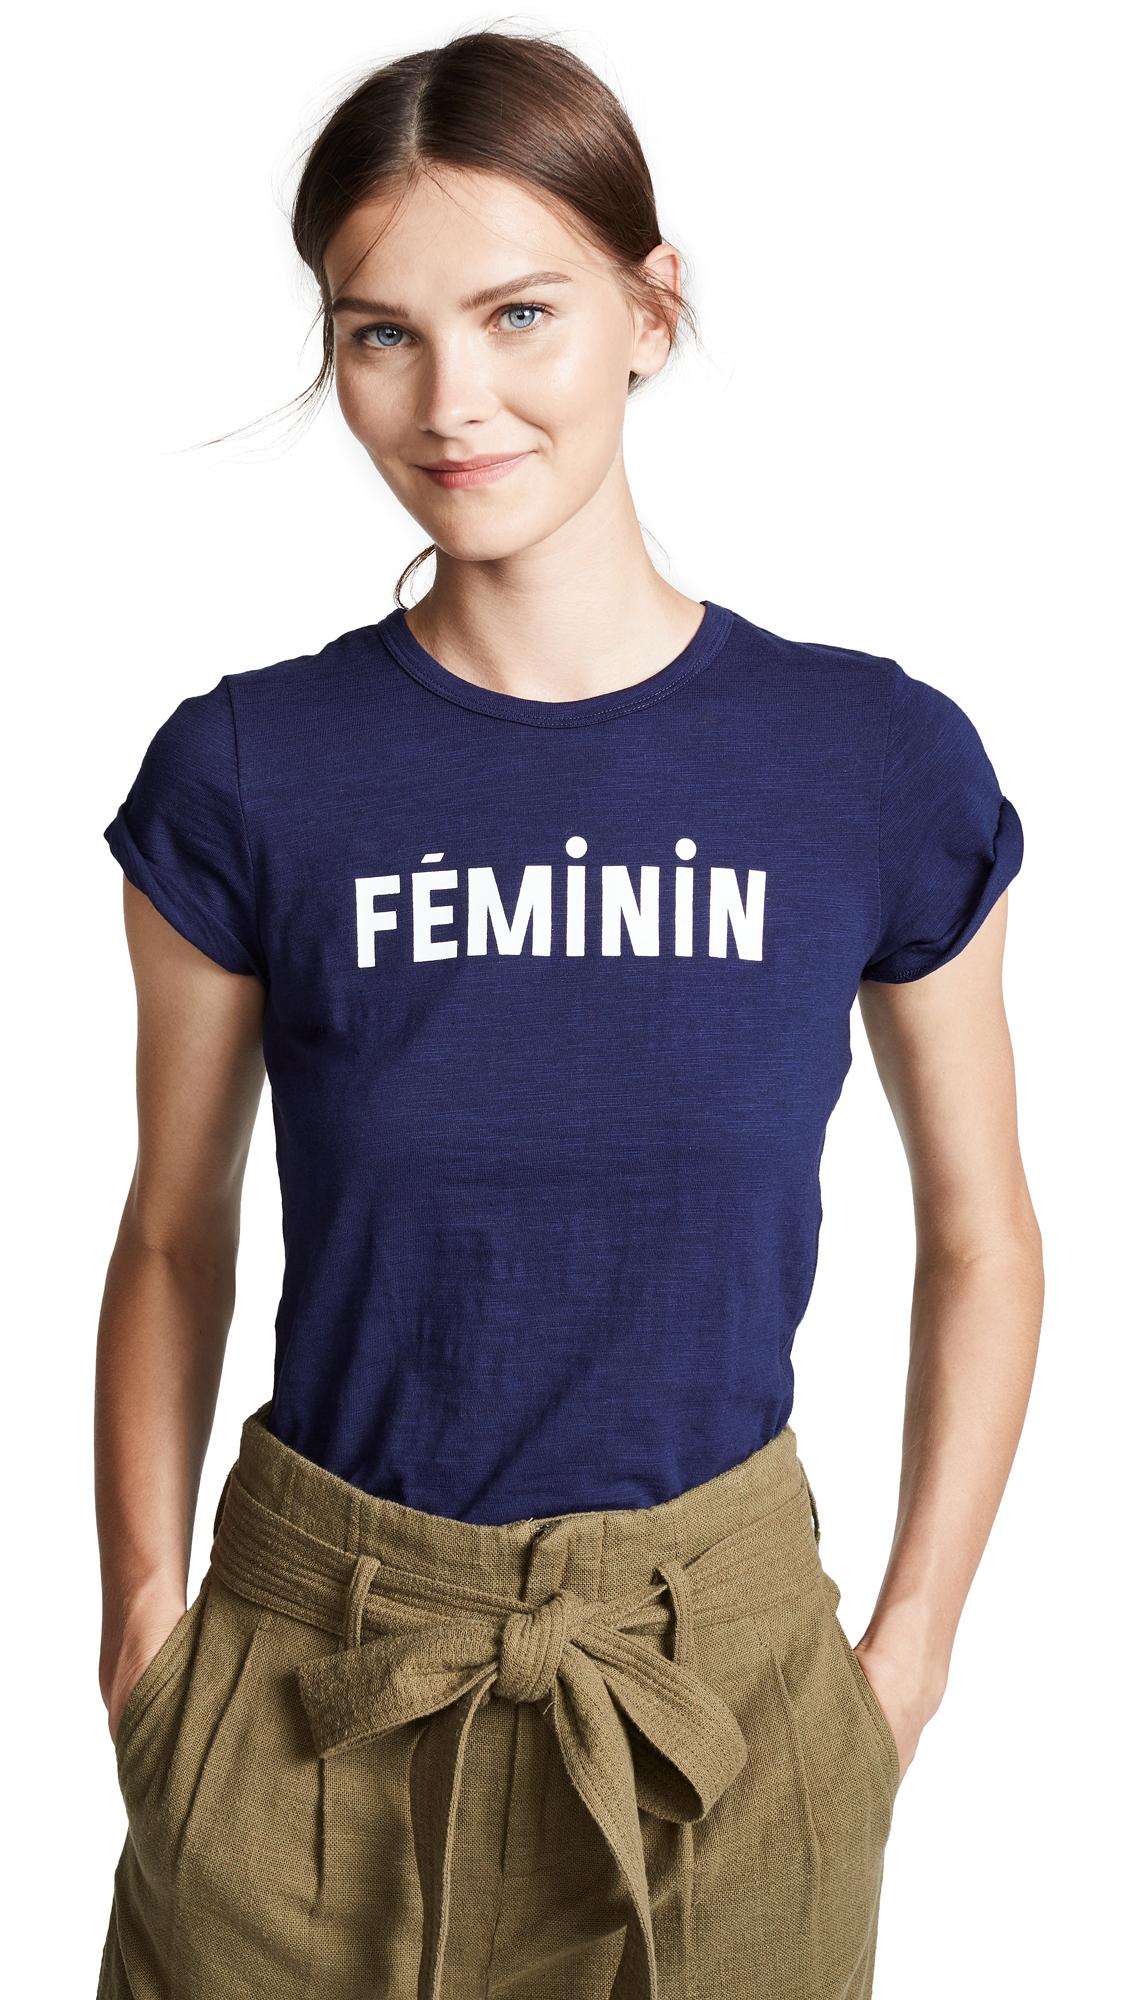 FEMININ TEE